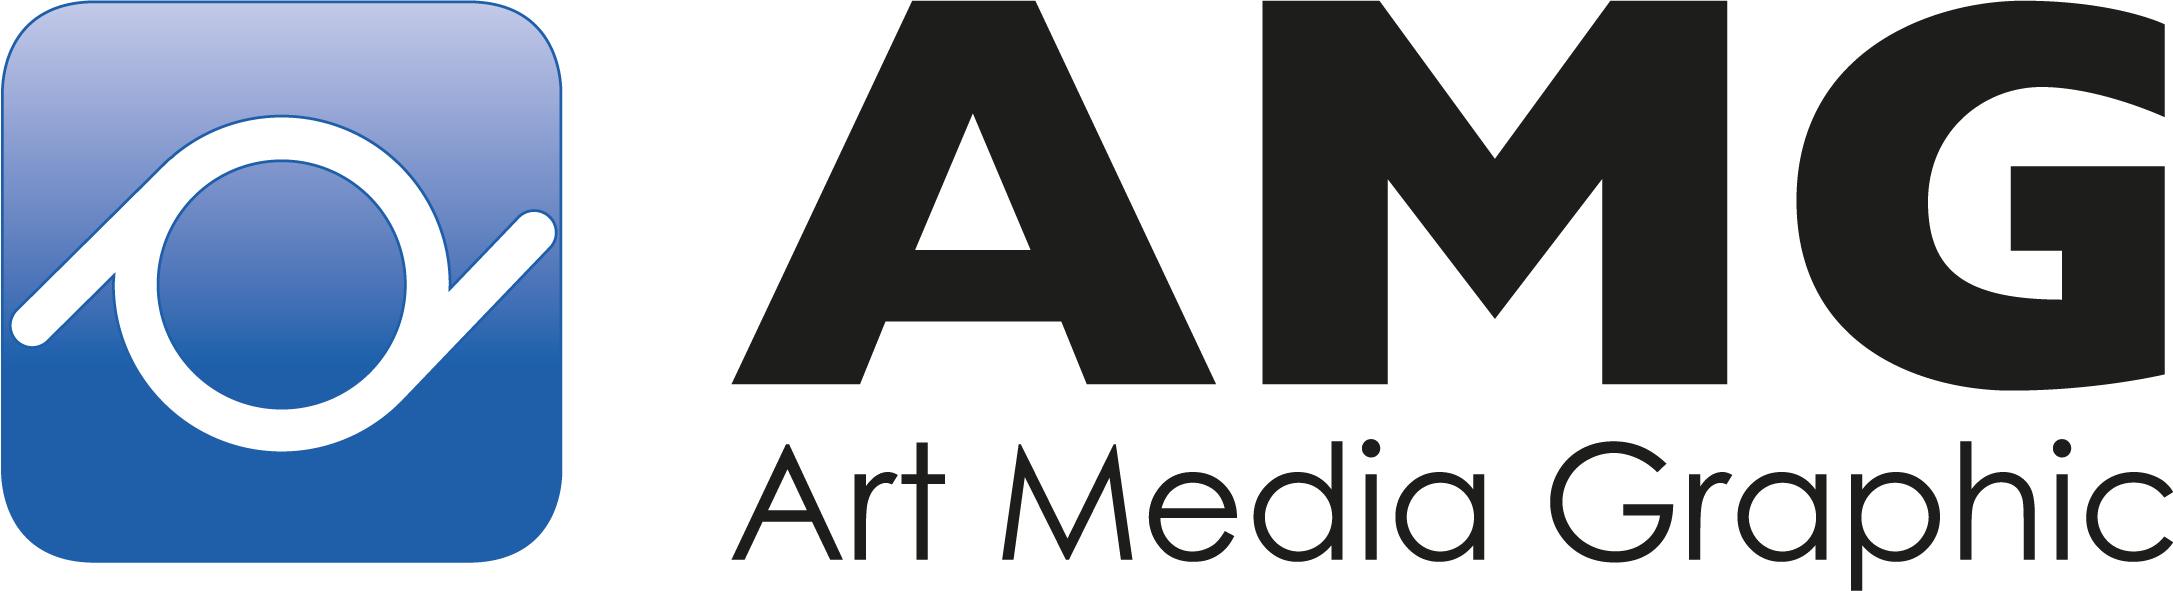 ArtMediaGraphic